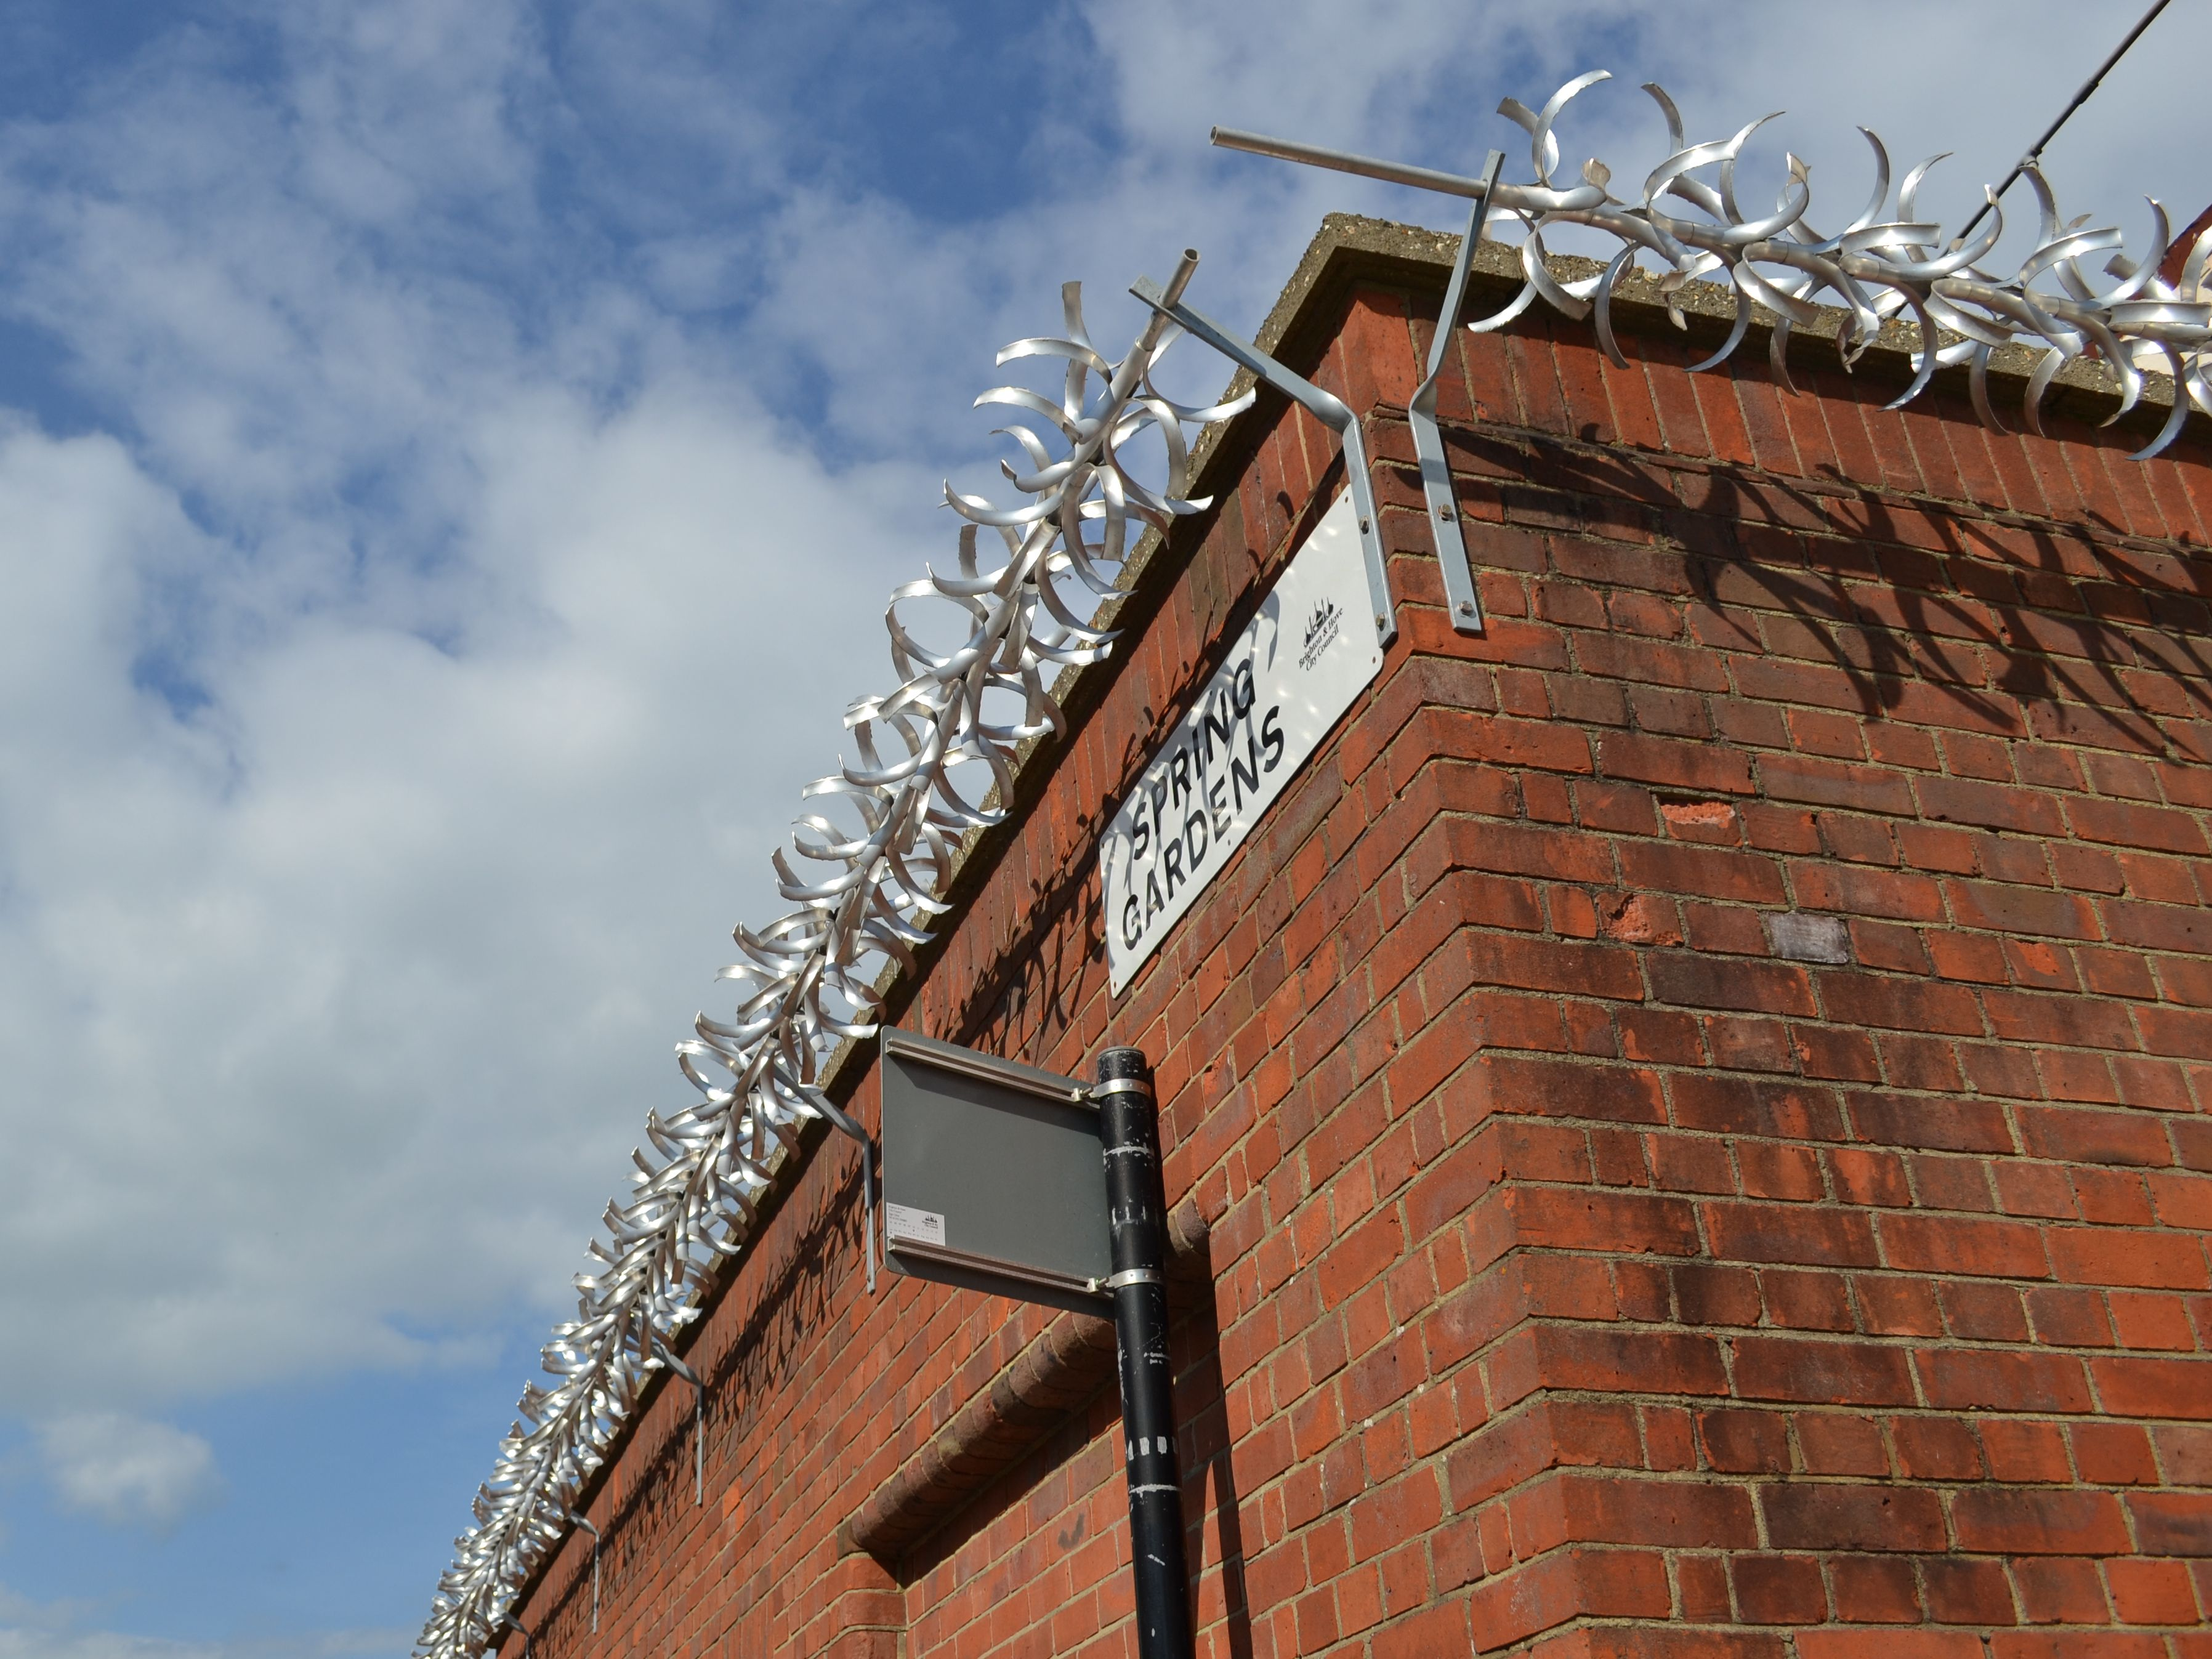 Barbed railings